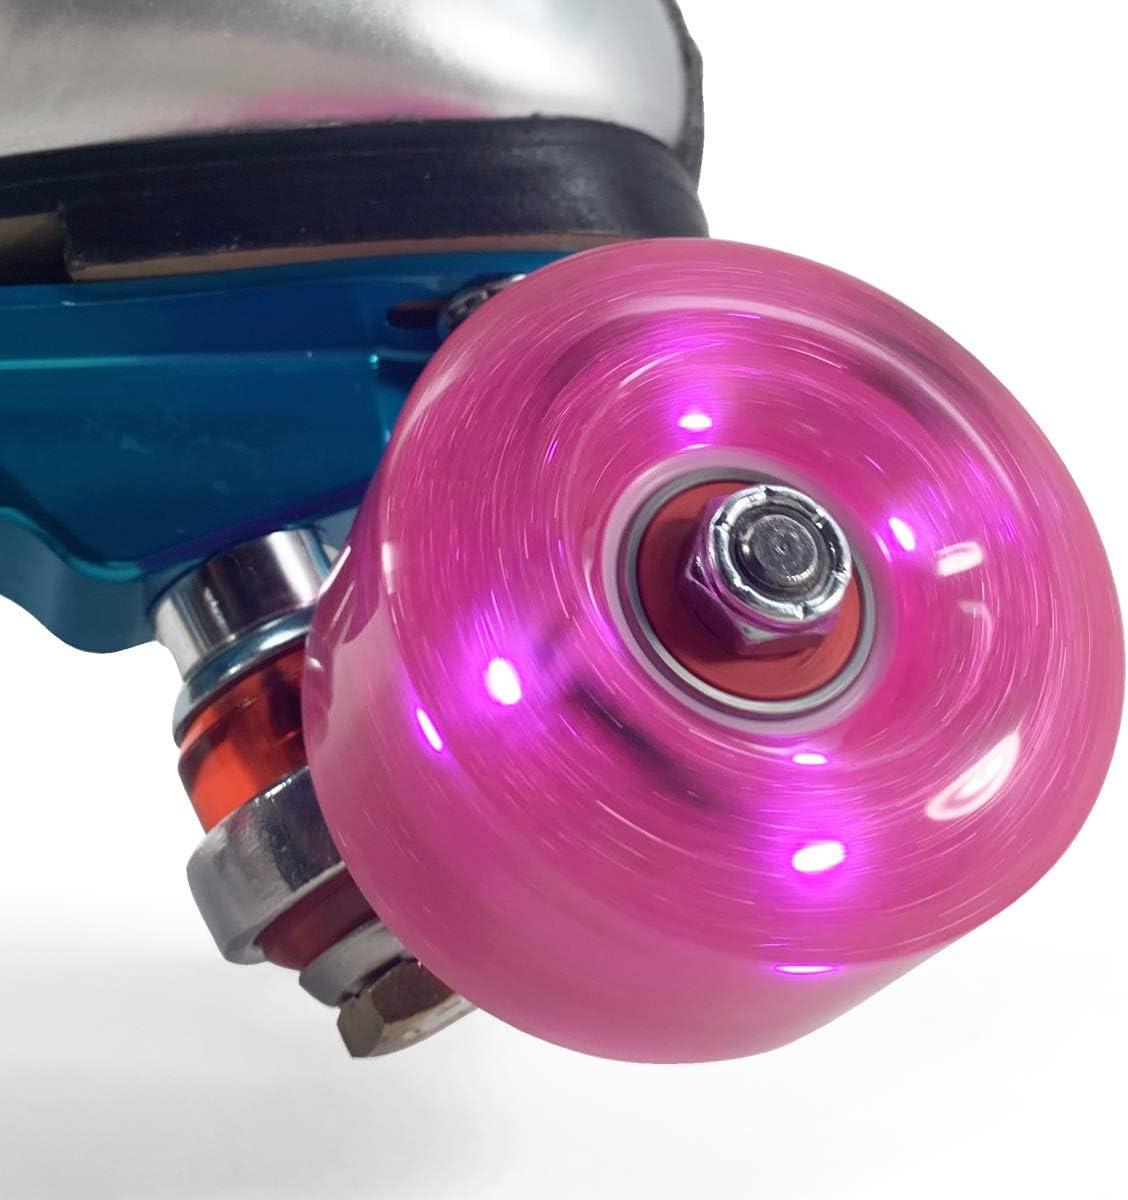 Now in 10 Colors Luminous Light Up LED Quad Roller Skate Wheels